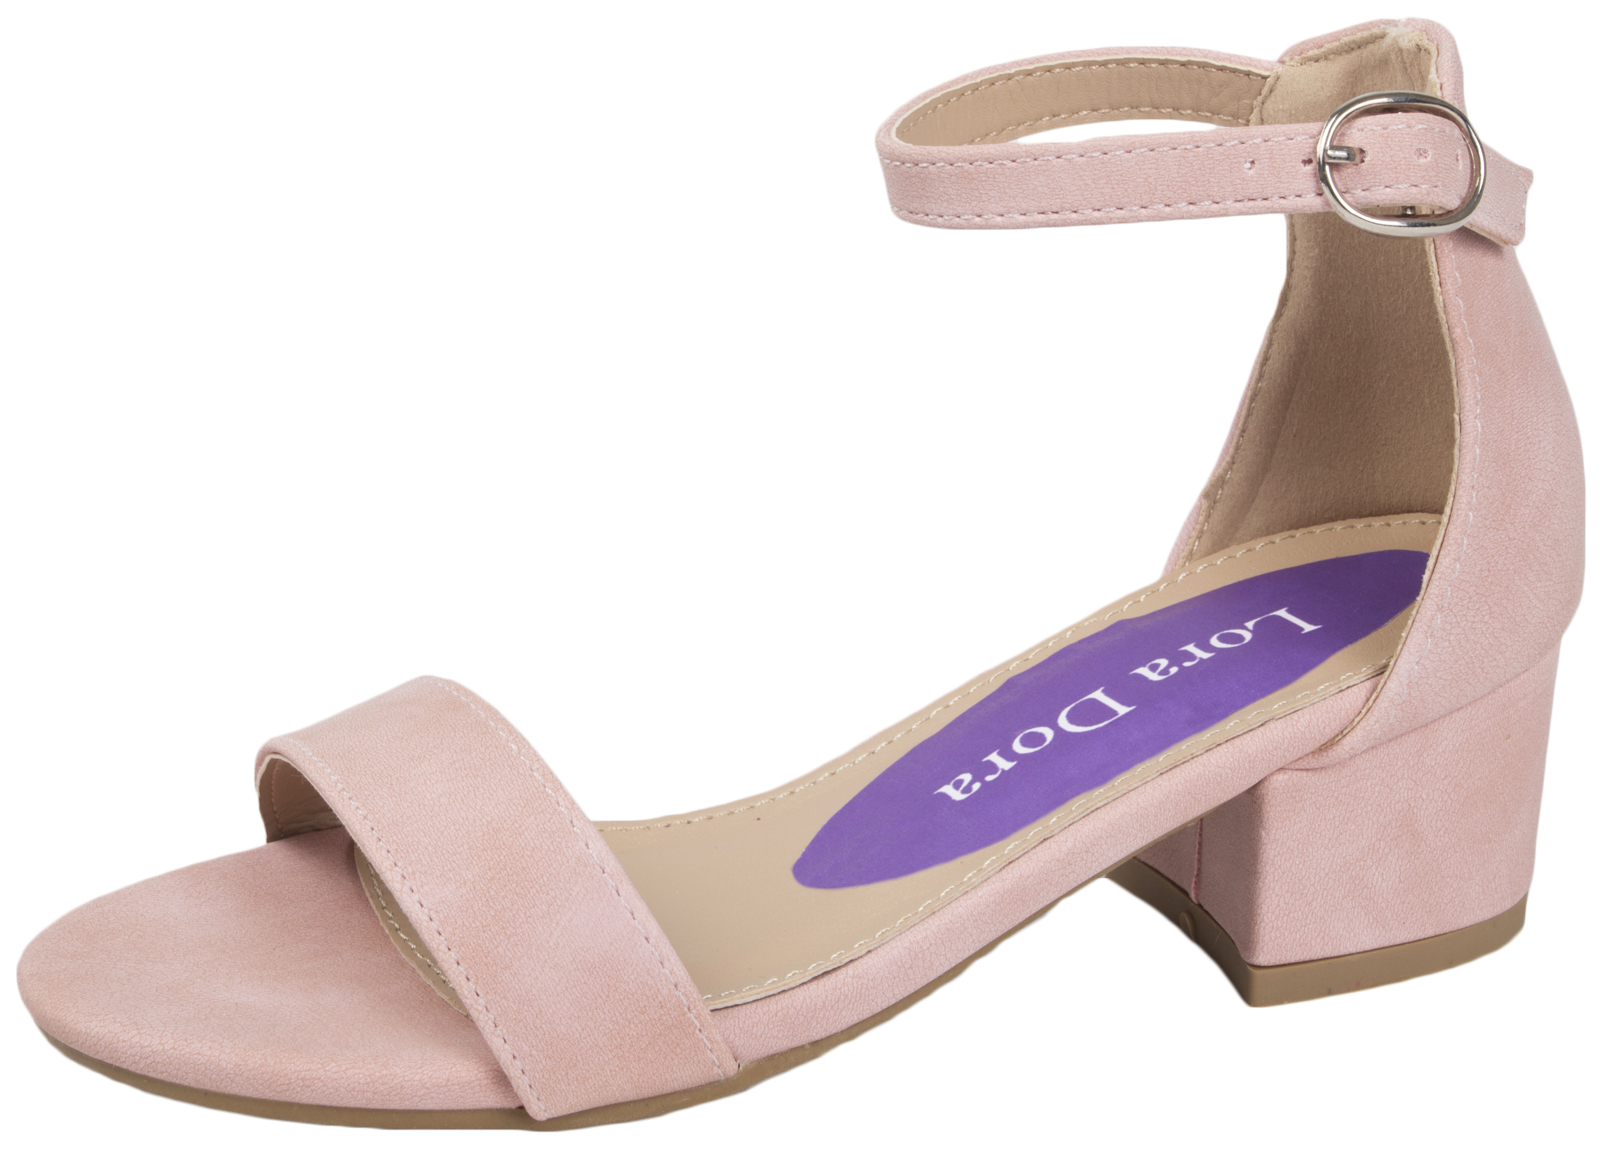 kids girls low block heel party shoes faux suede